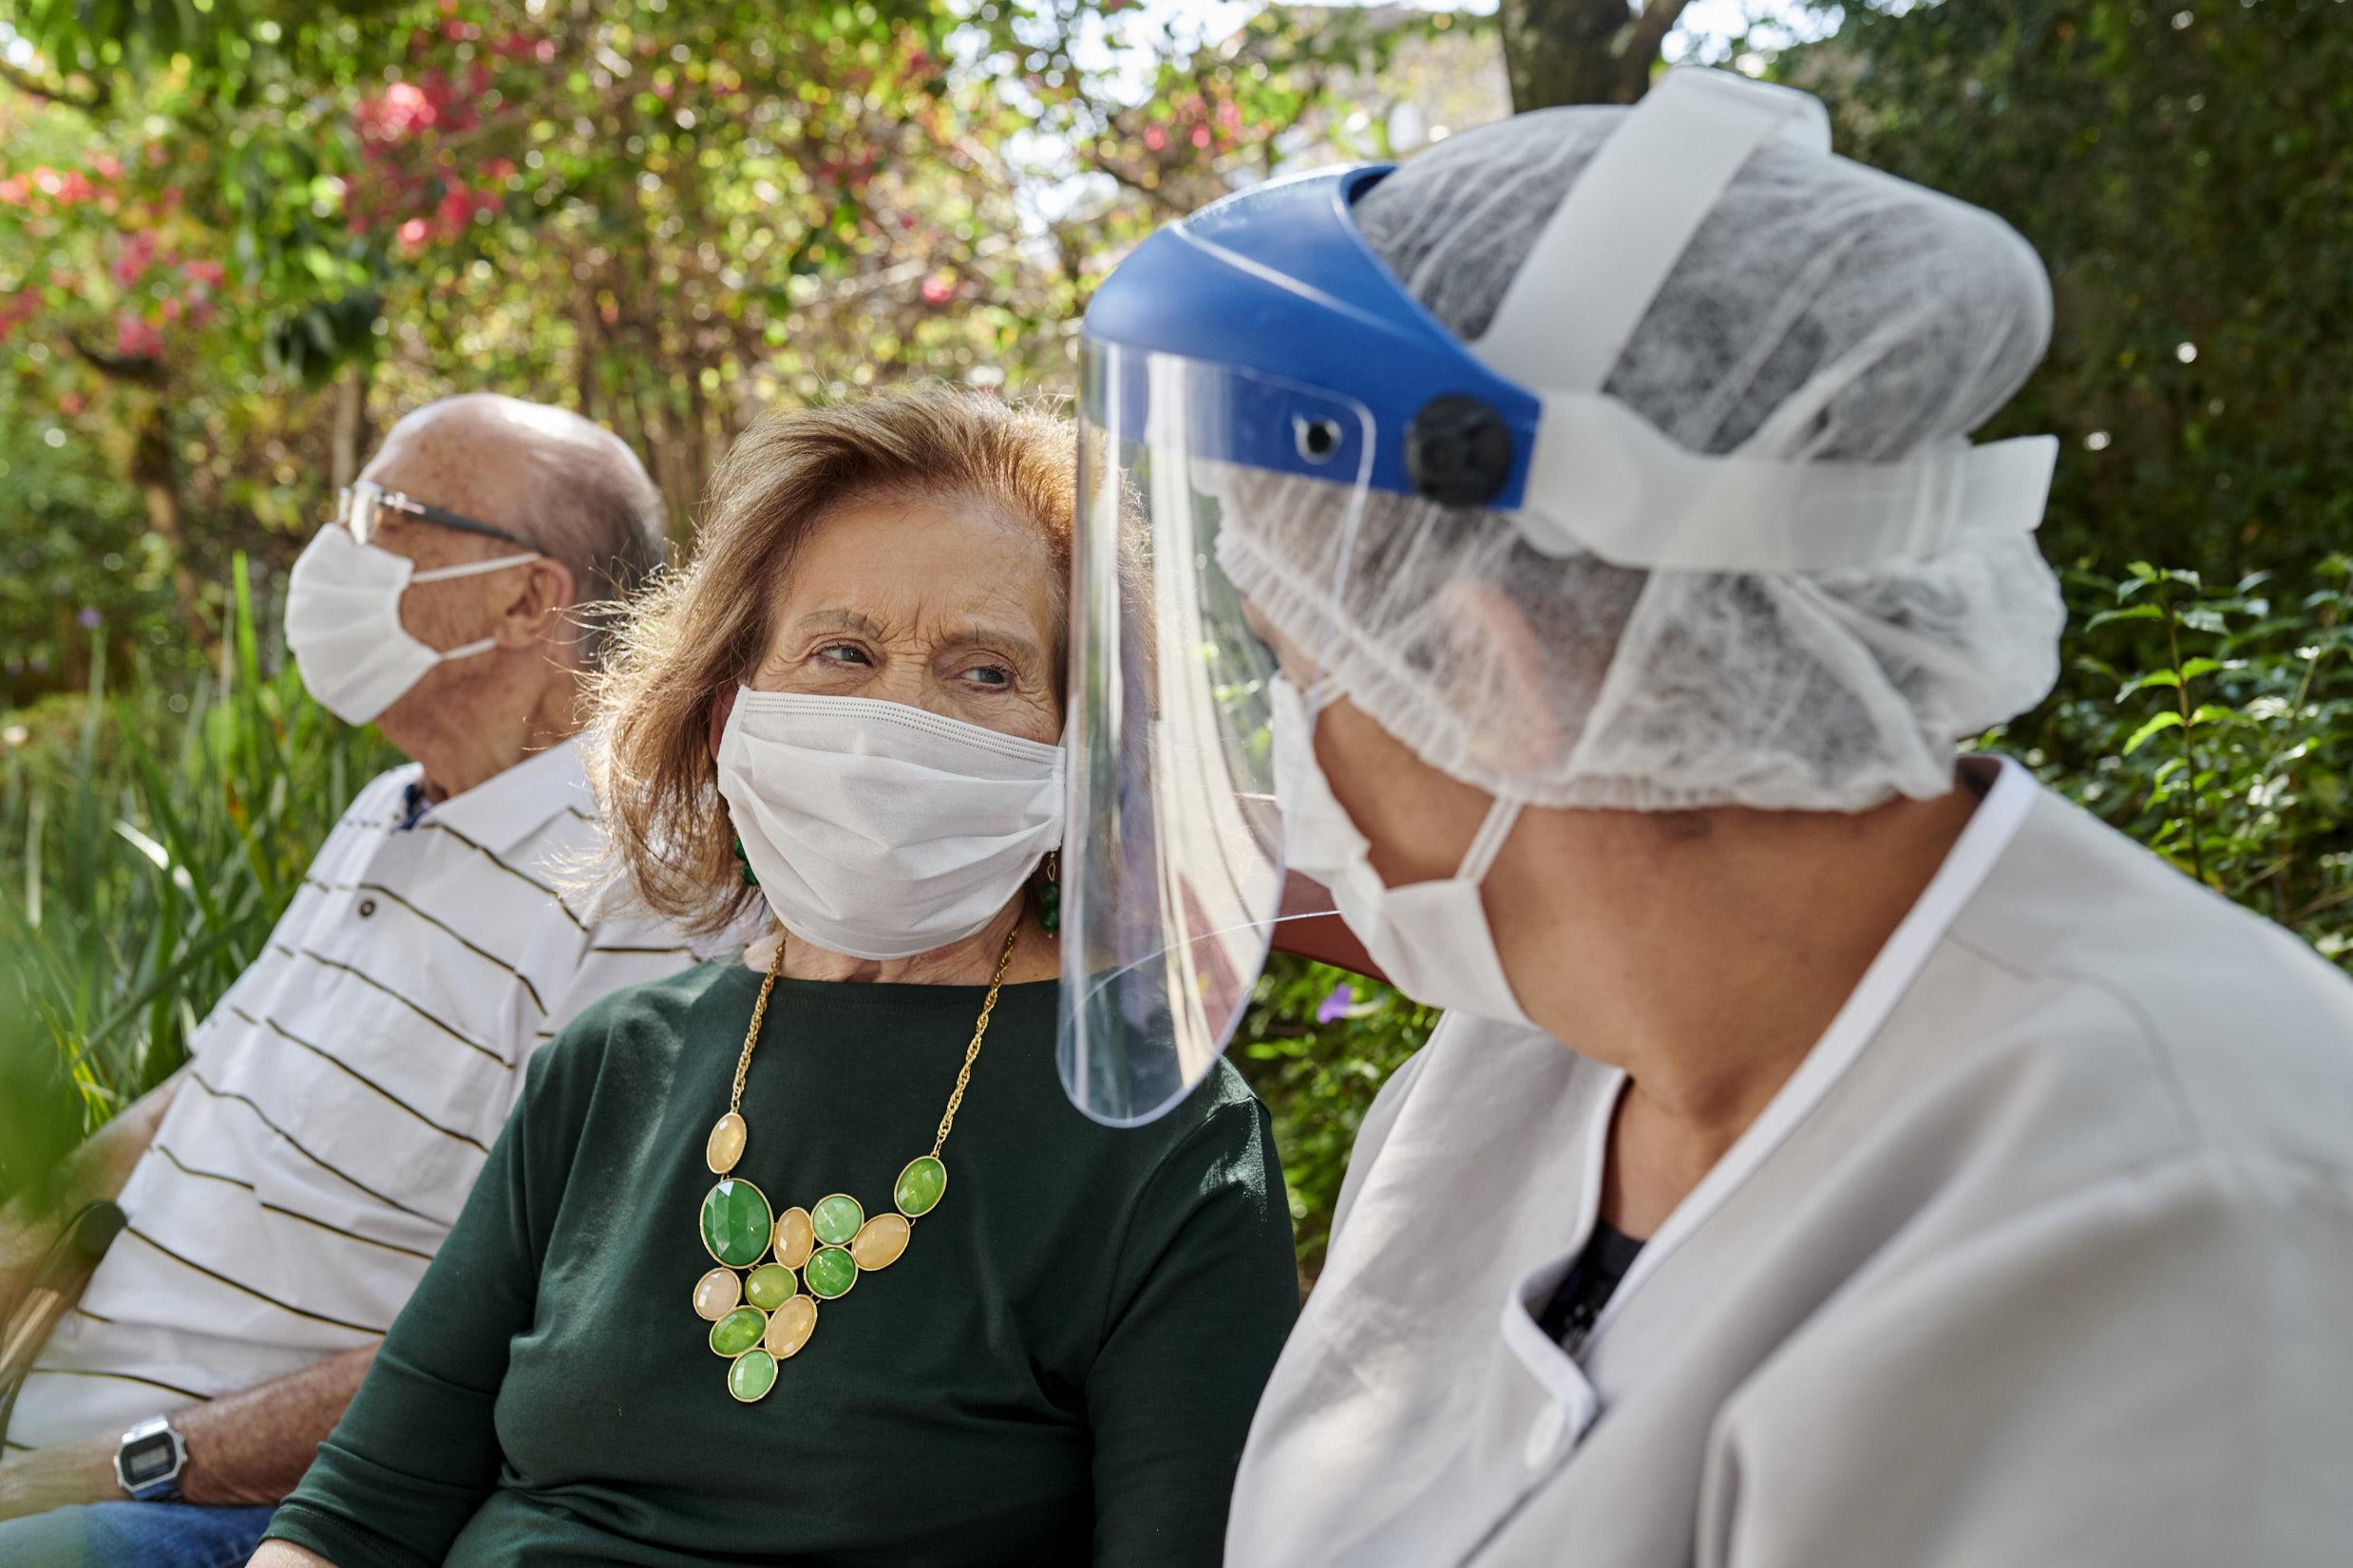 Cuidados na Pandemia do Coronavírus